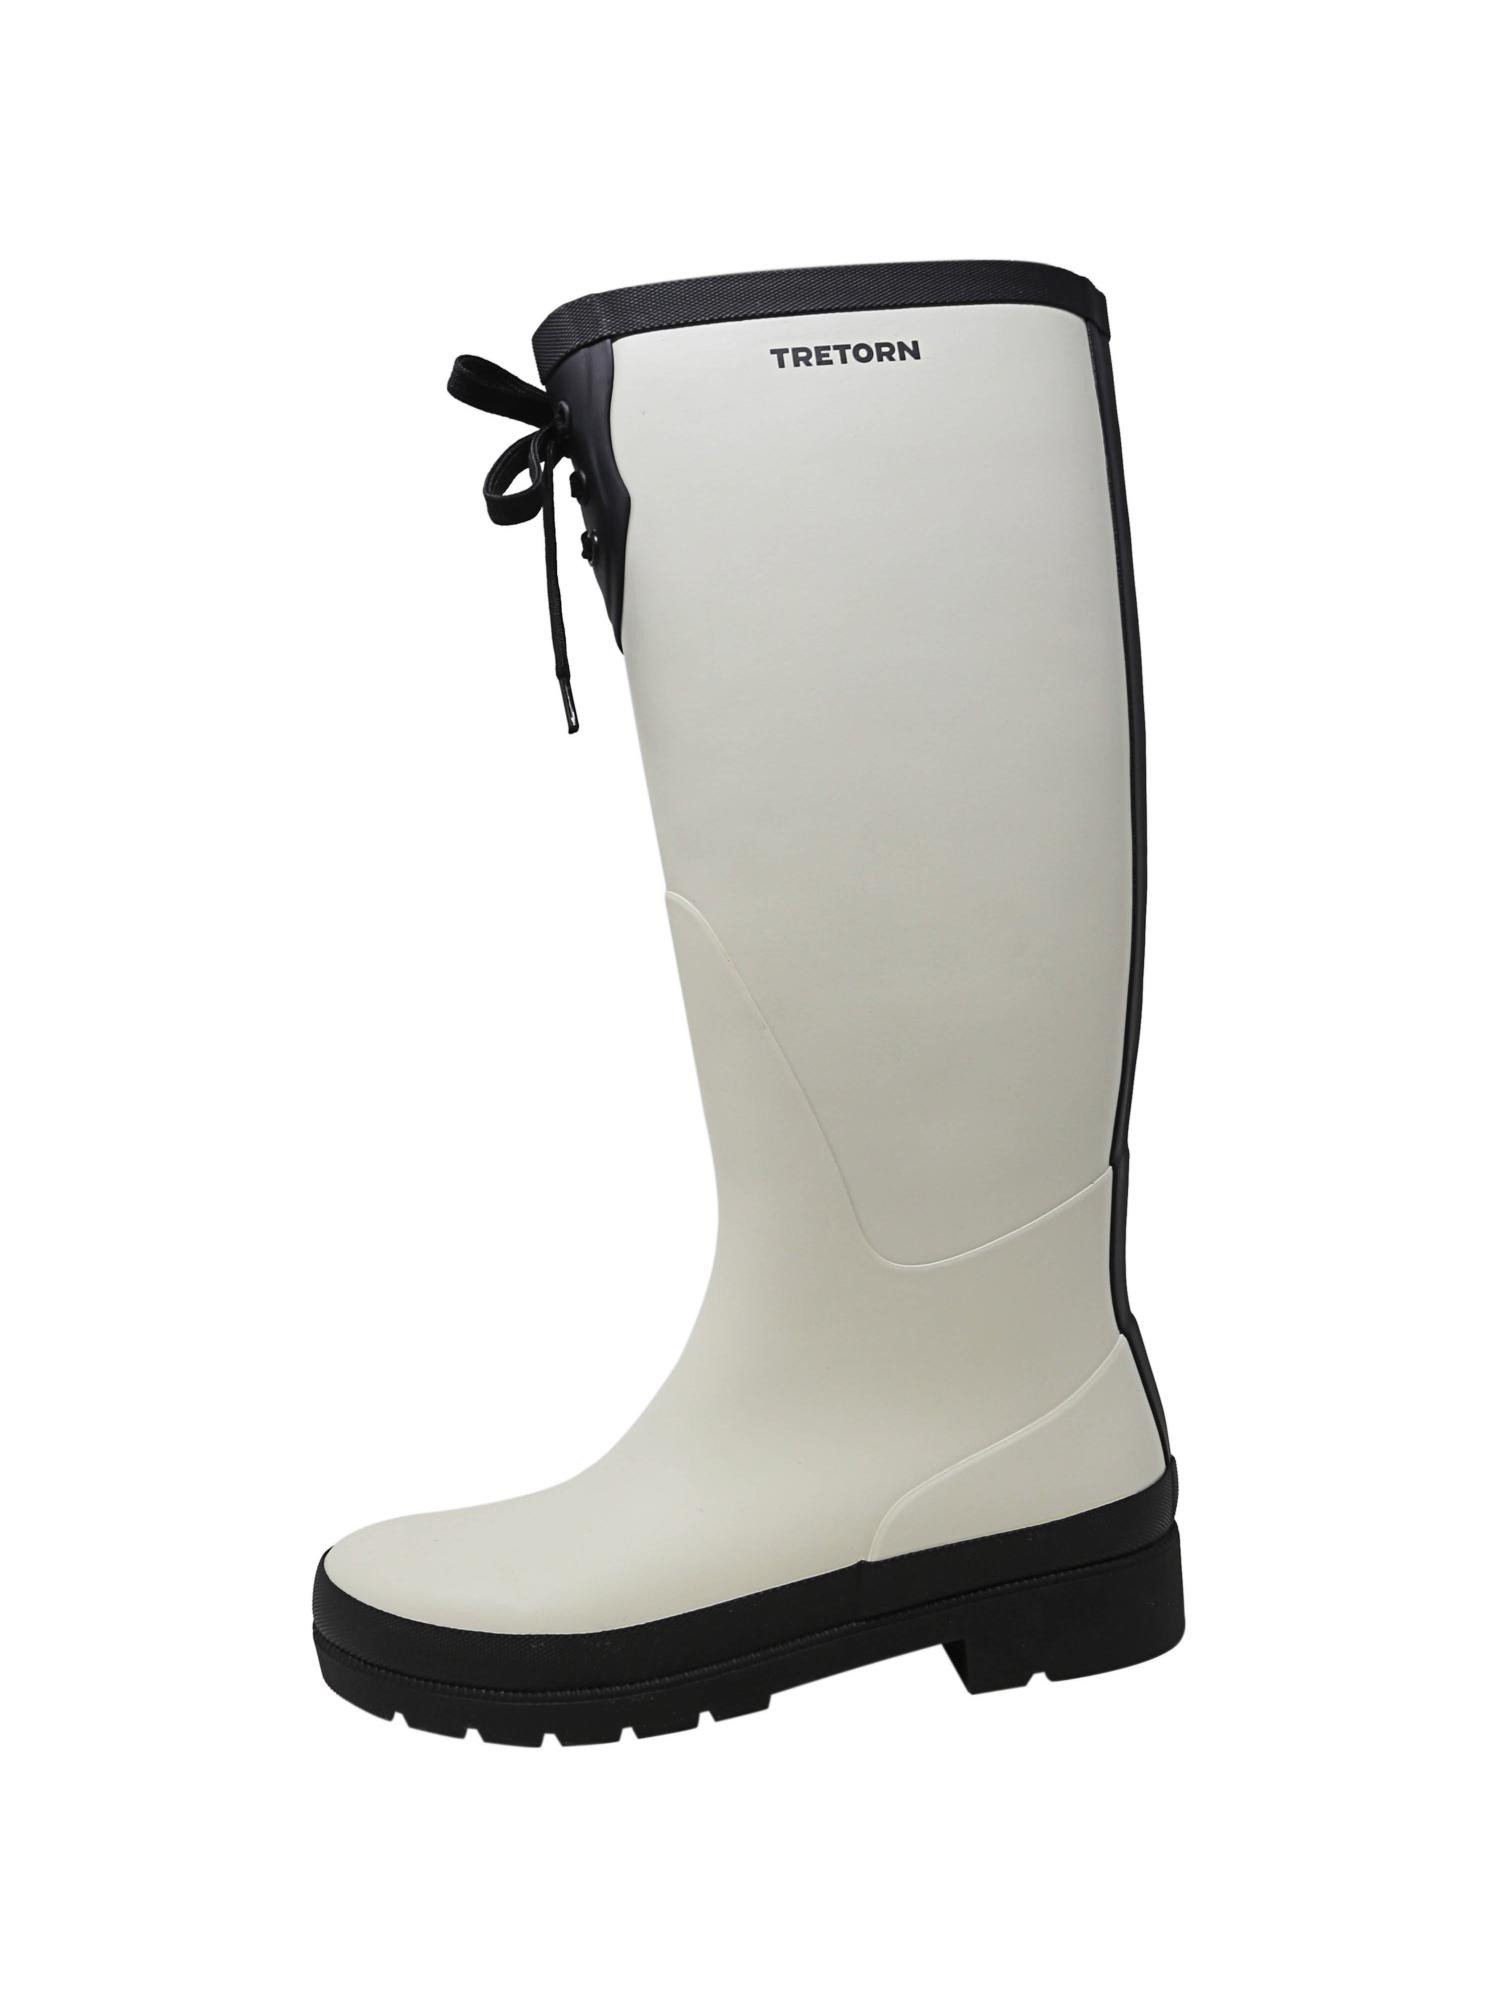 Tretorn-Women-039-s-Lacey-Rubber-Knee-High-Rain-Boot thumbnail 17